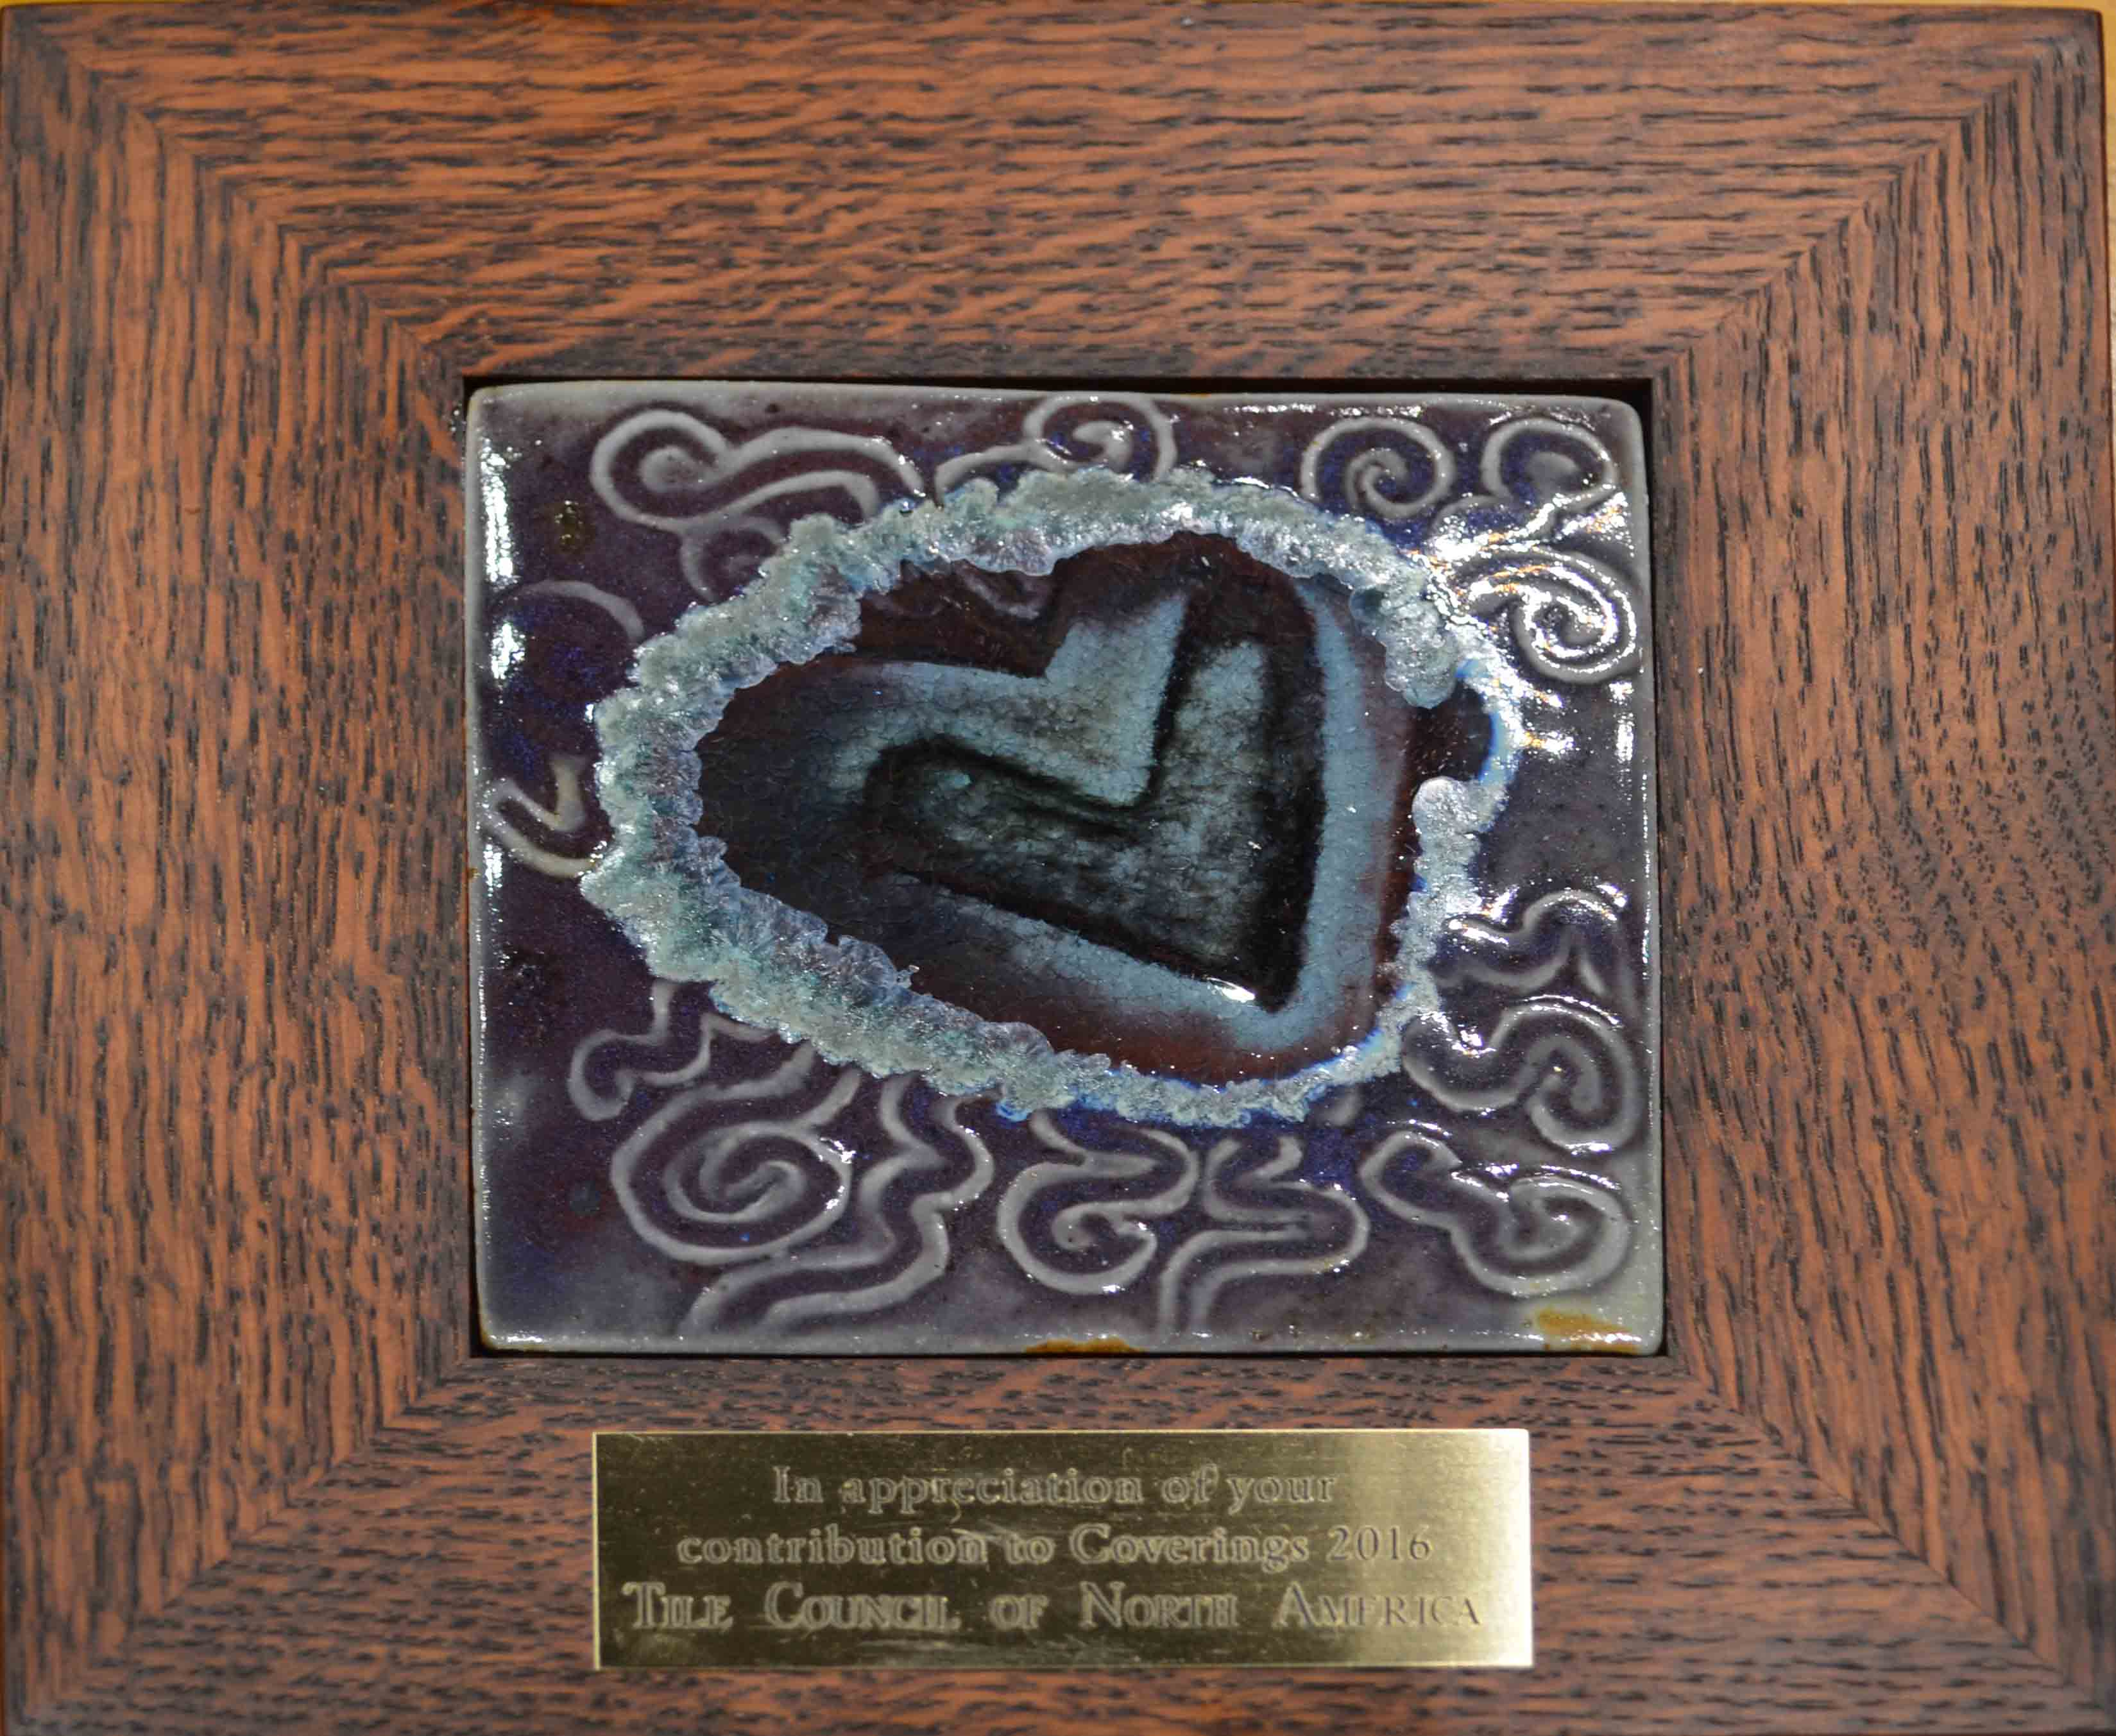 COVRINGS北美陶瓷与石材展突出贡献奖